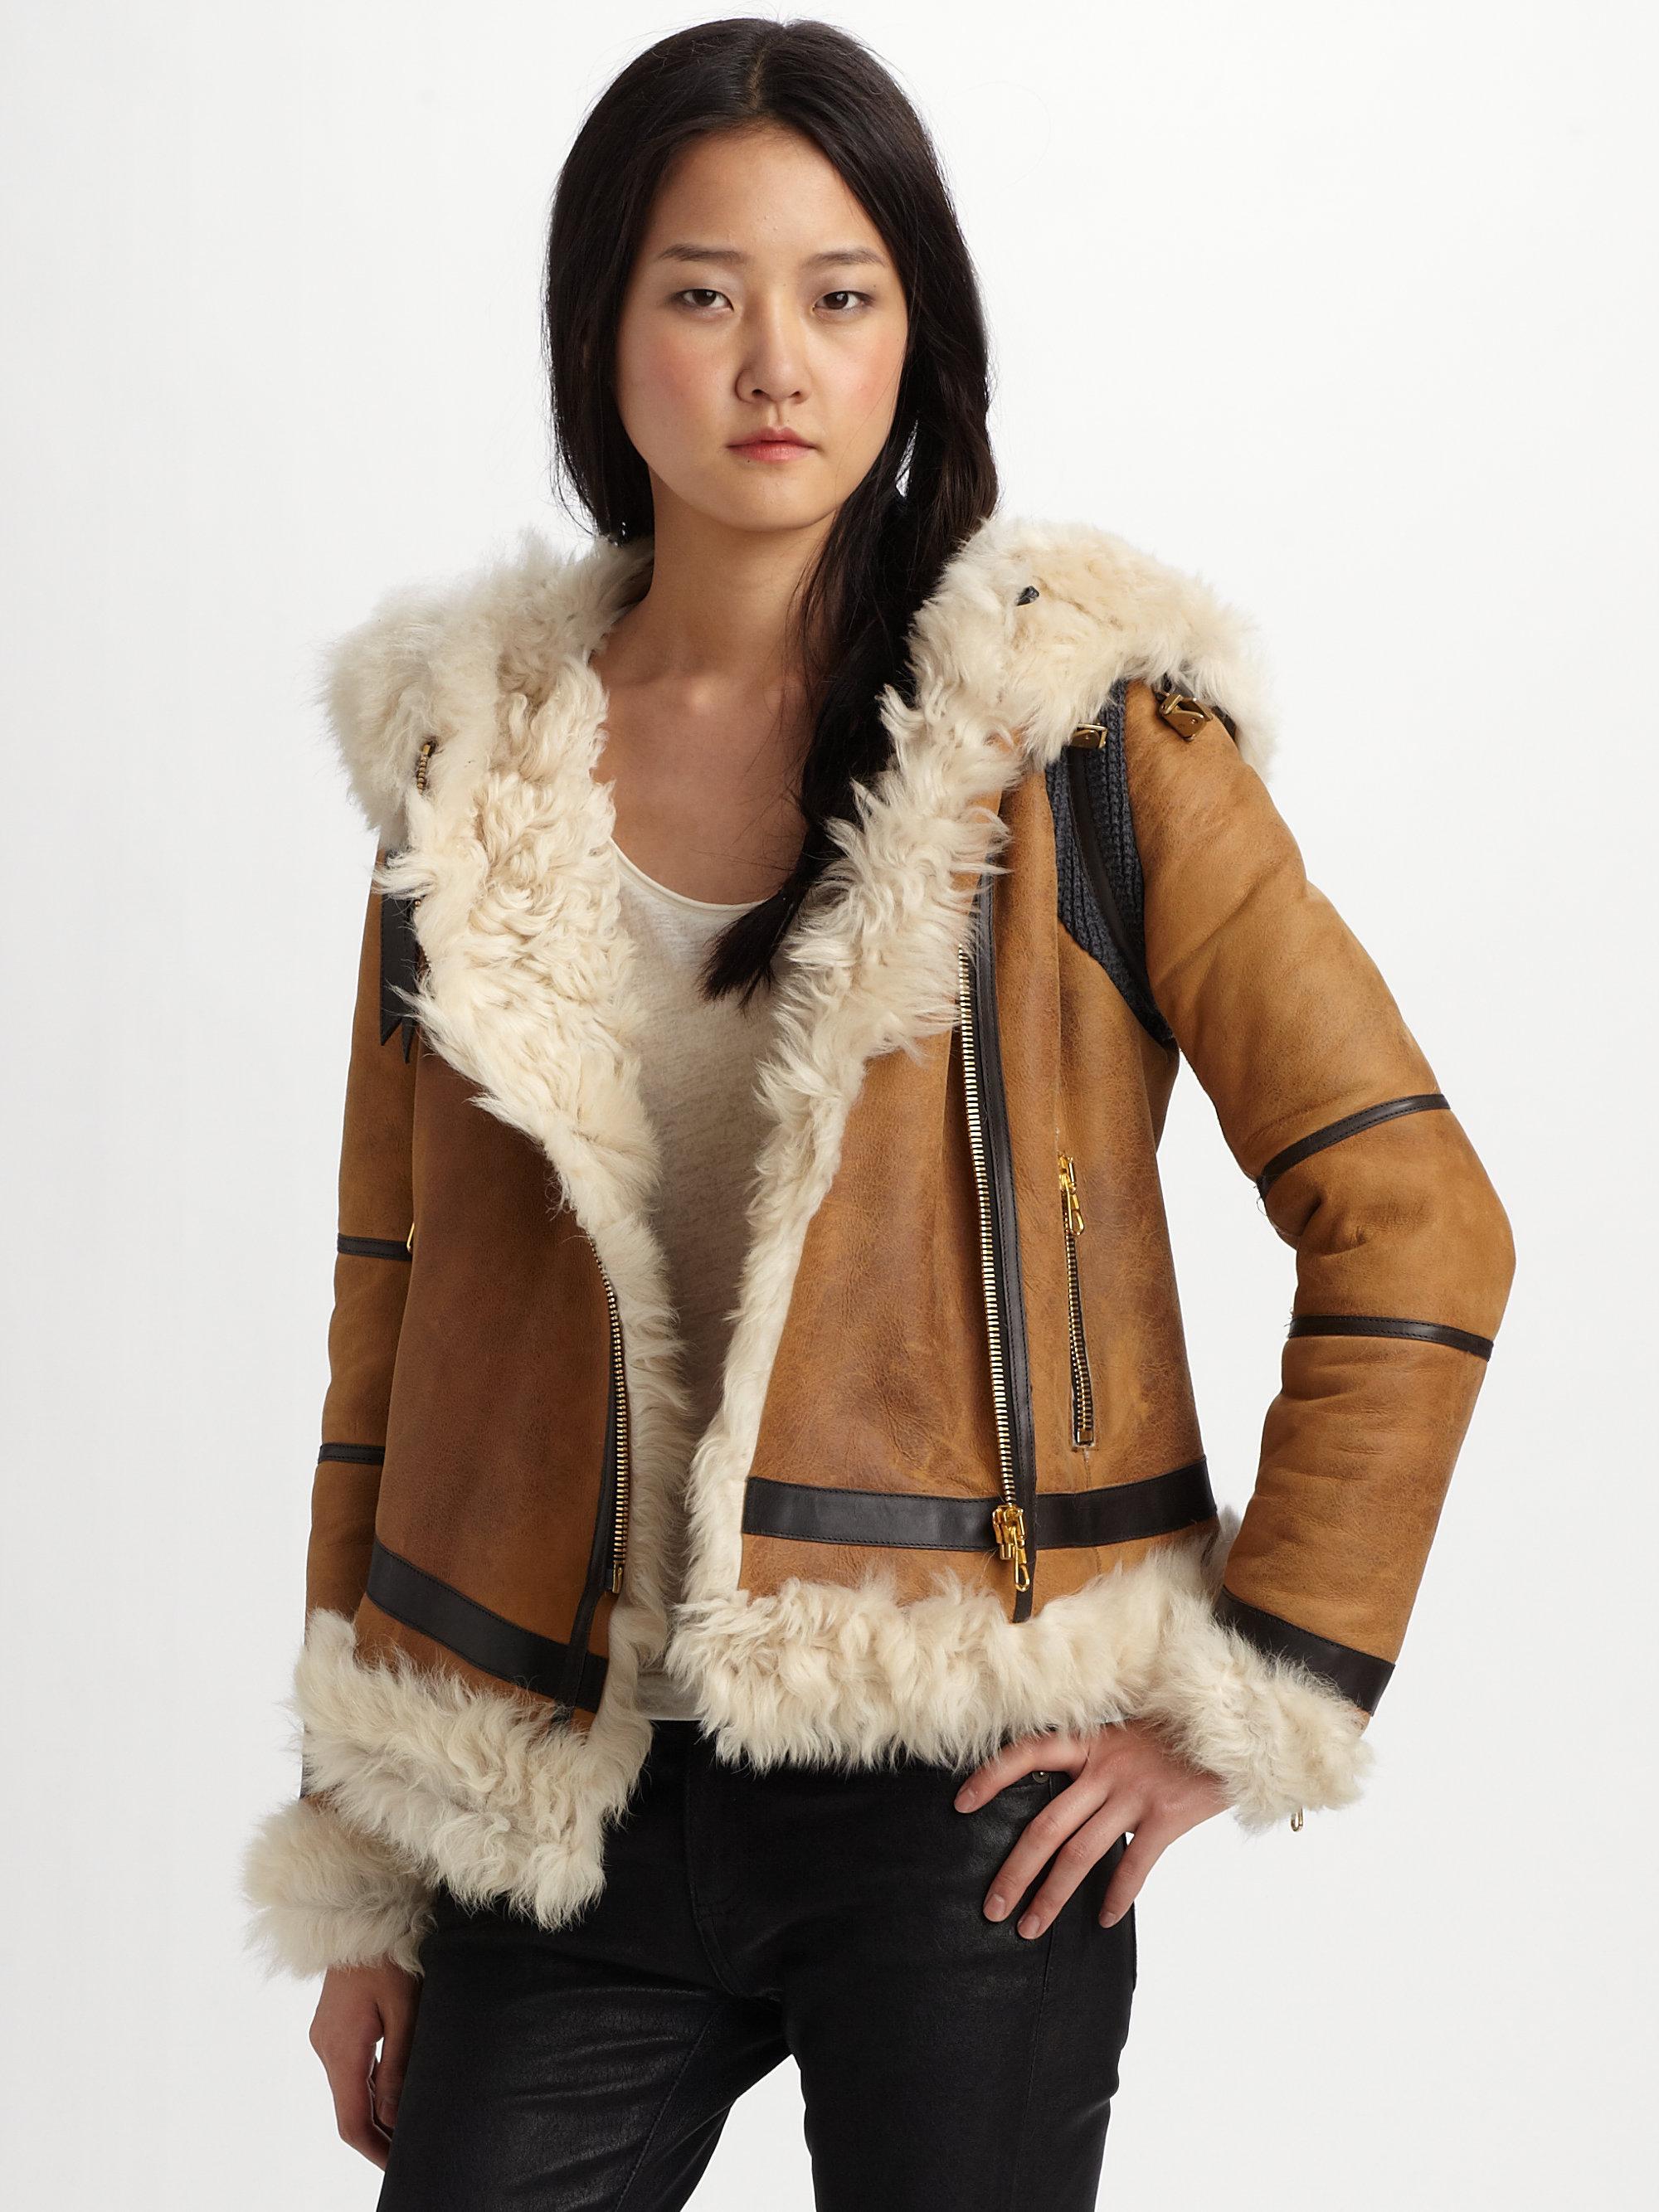 Rag & bone Shoreditch Shearling Jacket in Brown | Lyst